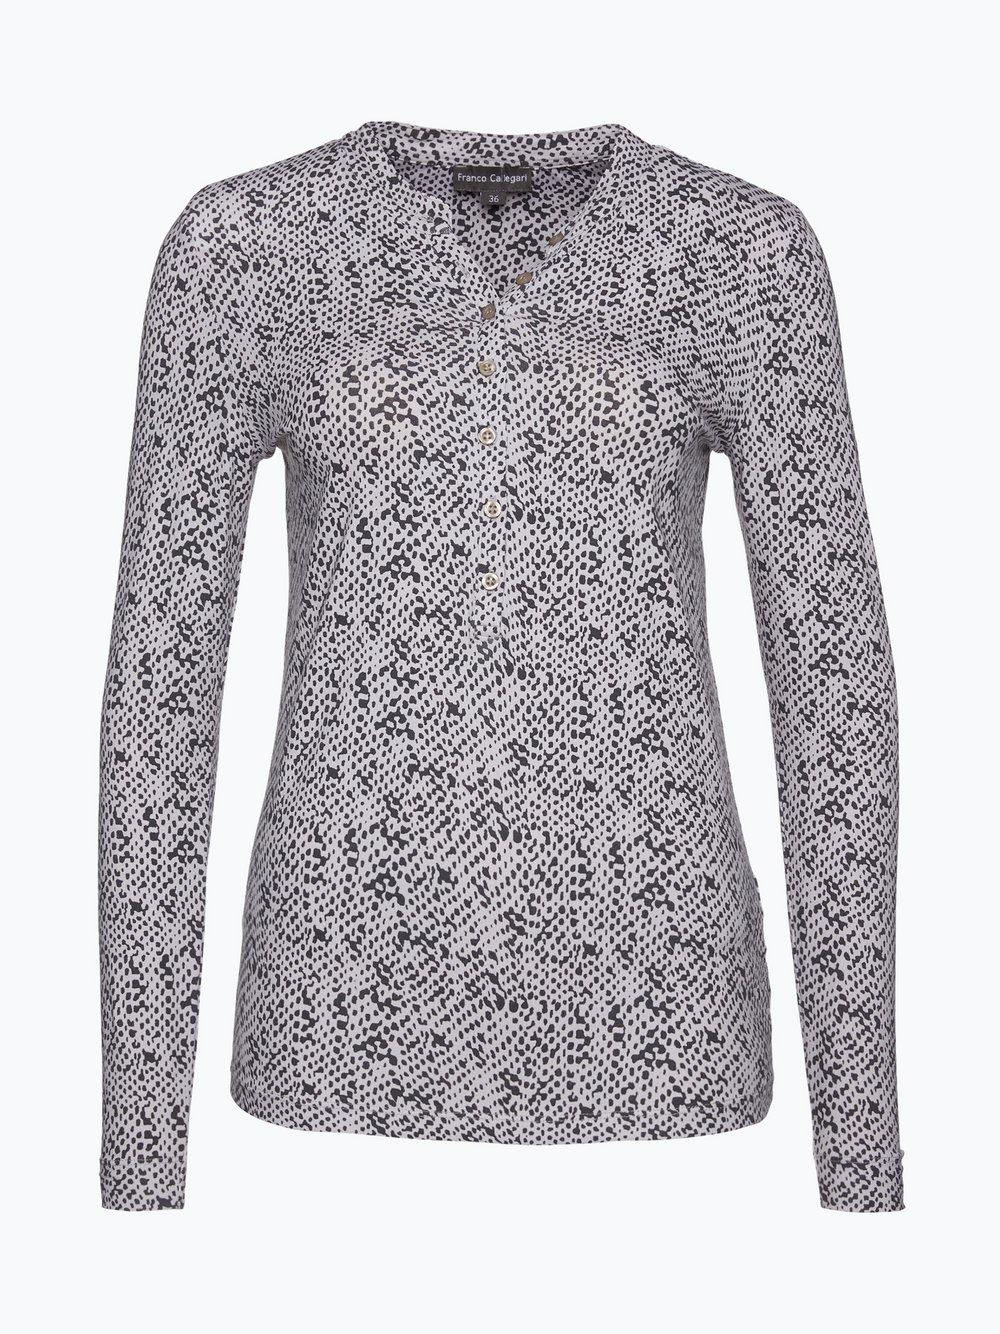 280bd6cb03ec9d Franco Callegari Damska koszulka z długim rękawem kup online ...